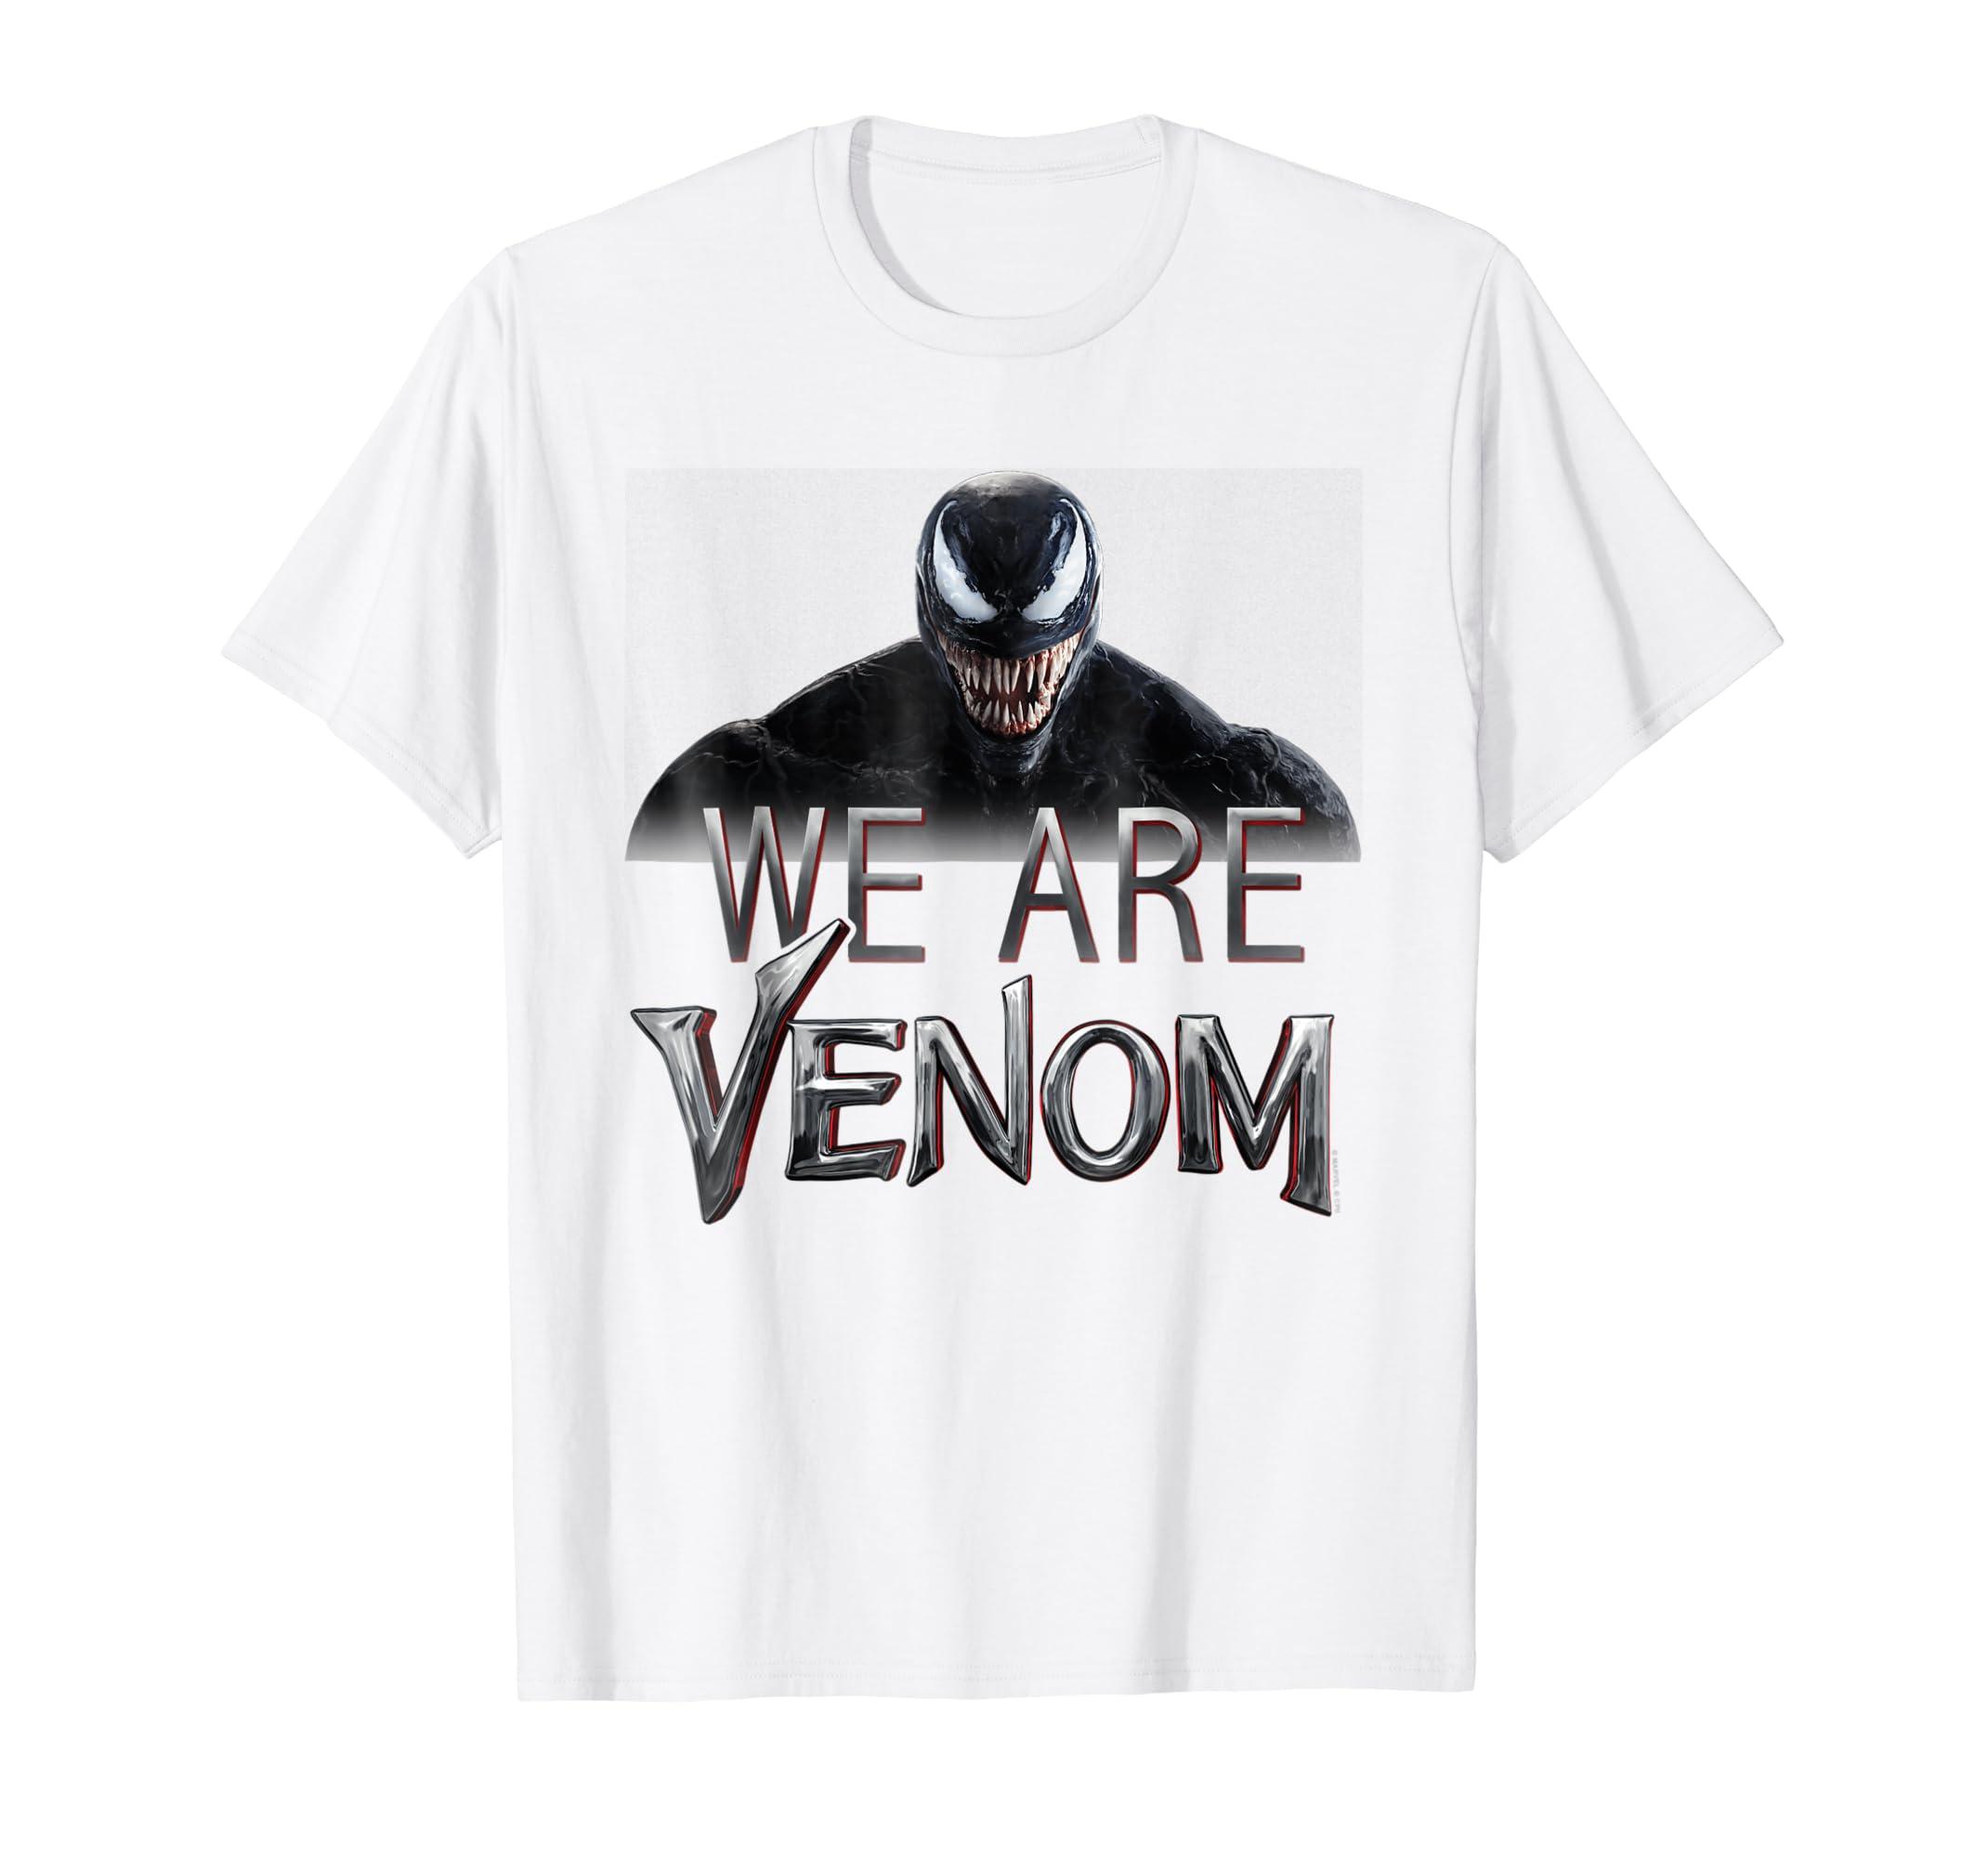 Venom Grin Vector: Venom We Are Venom Big Grin Graphic T Shirt-4LVS